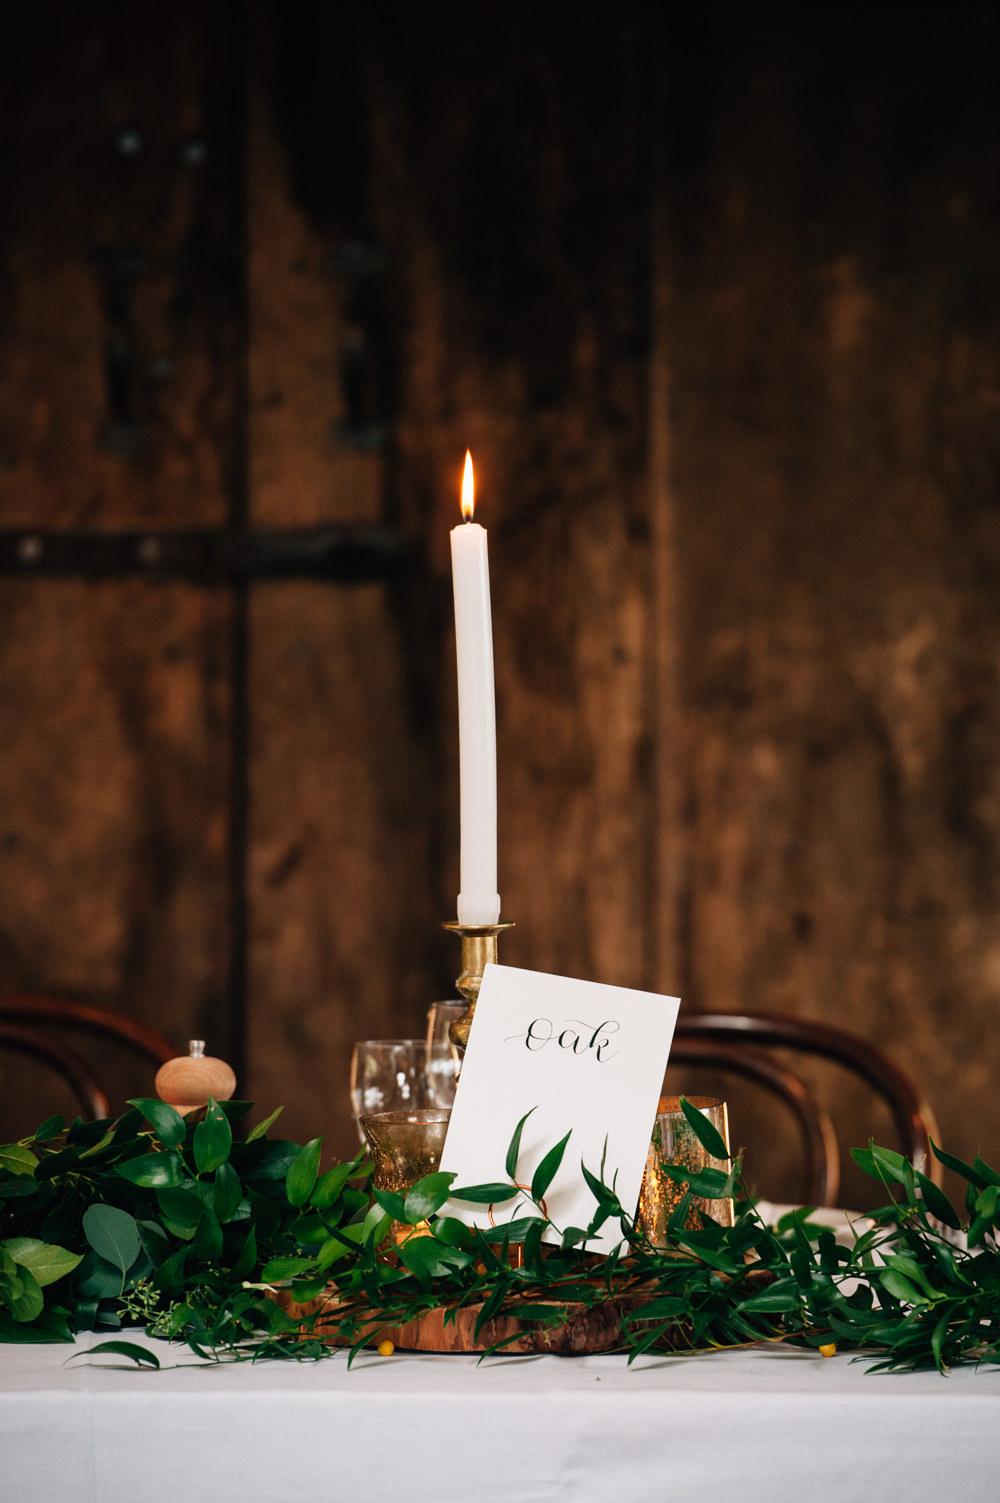 Calligraphy Table Name Candle Greenery Foliage Table Flowers Decor Cripps Barn Wedding Isobel Murphy Photography